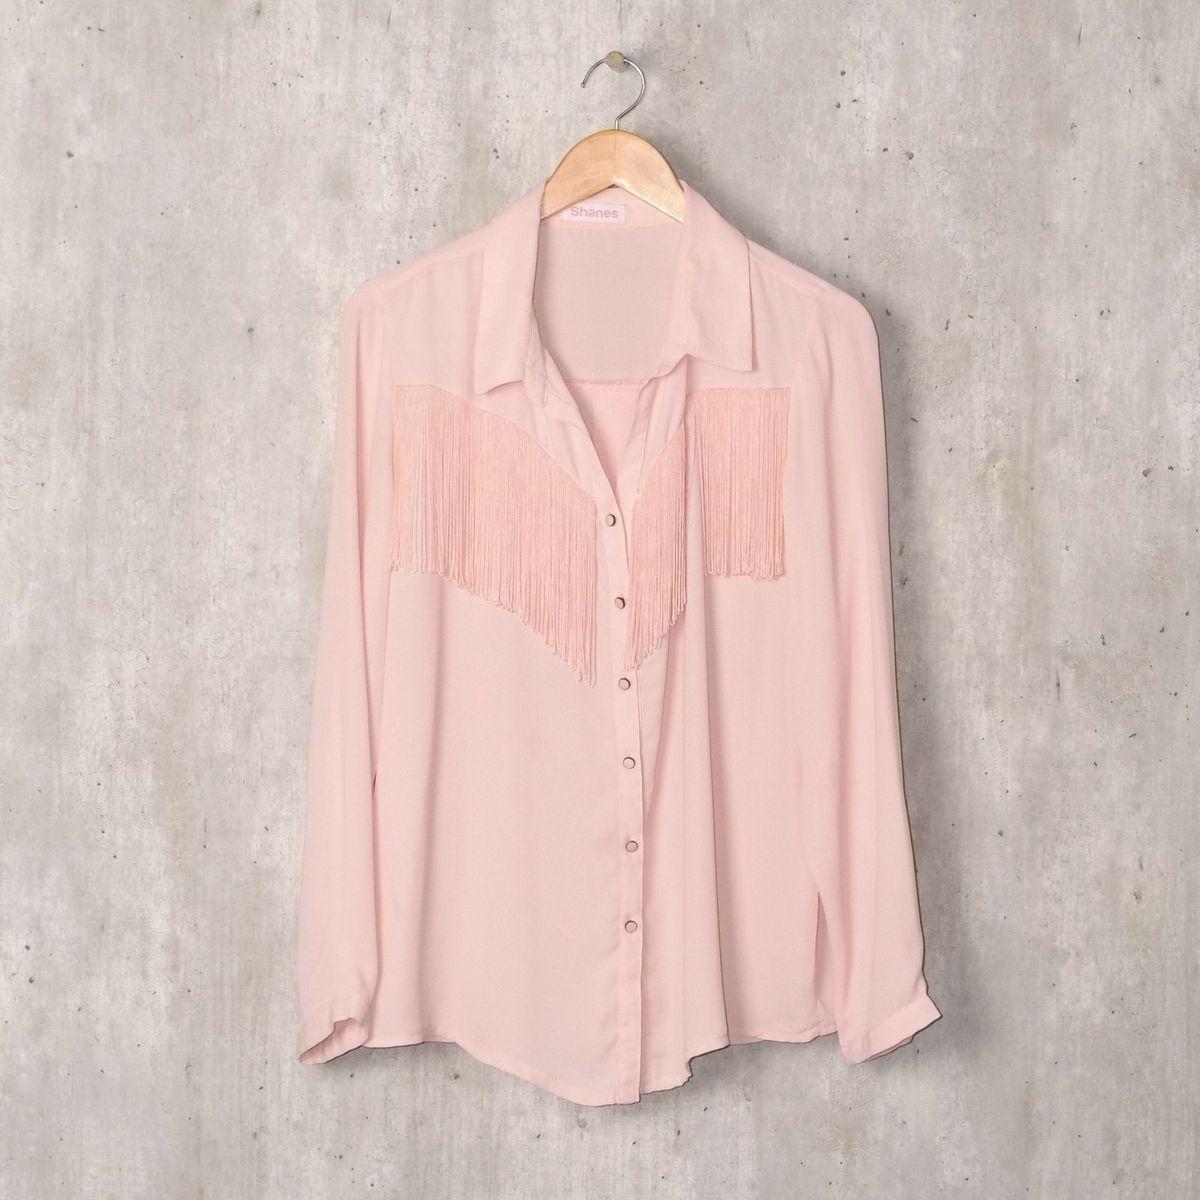 2e435eb6c6013 Camisa Rosa Claro